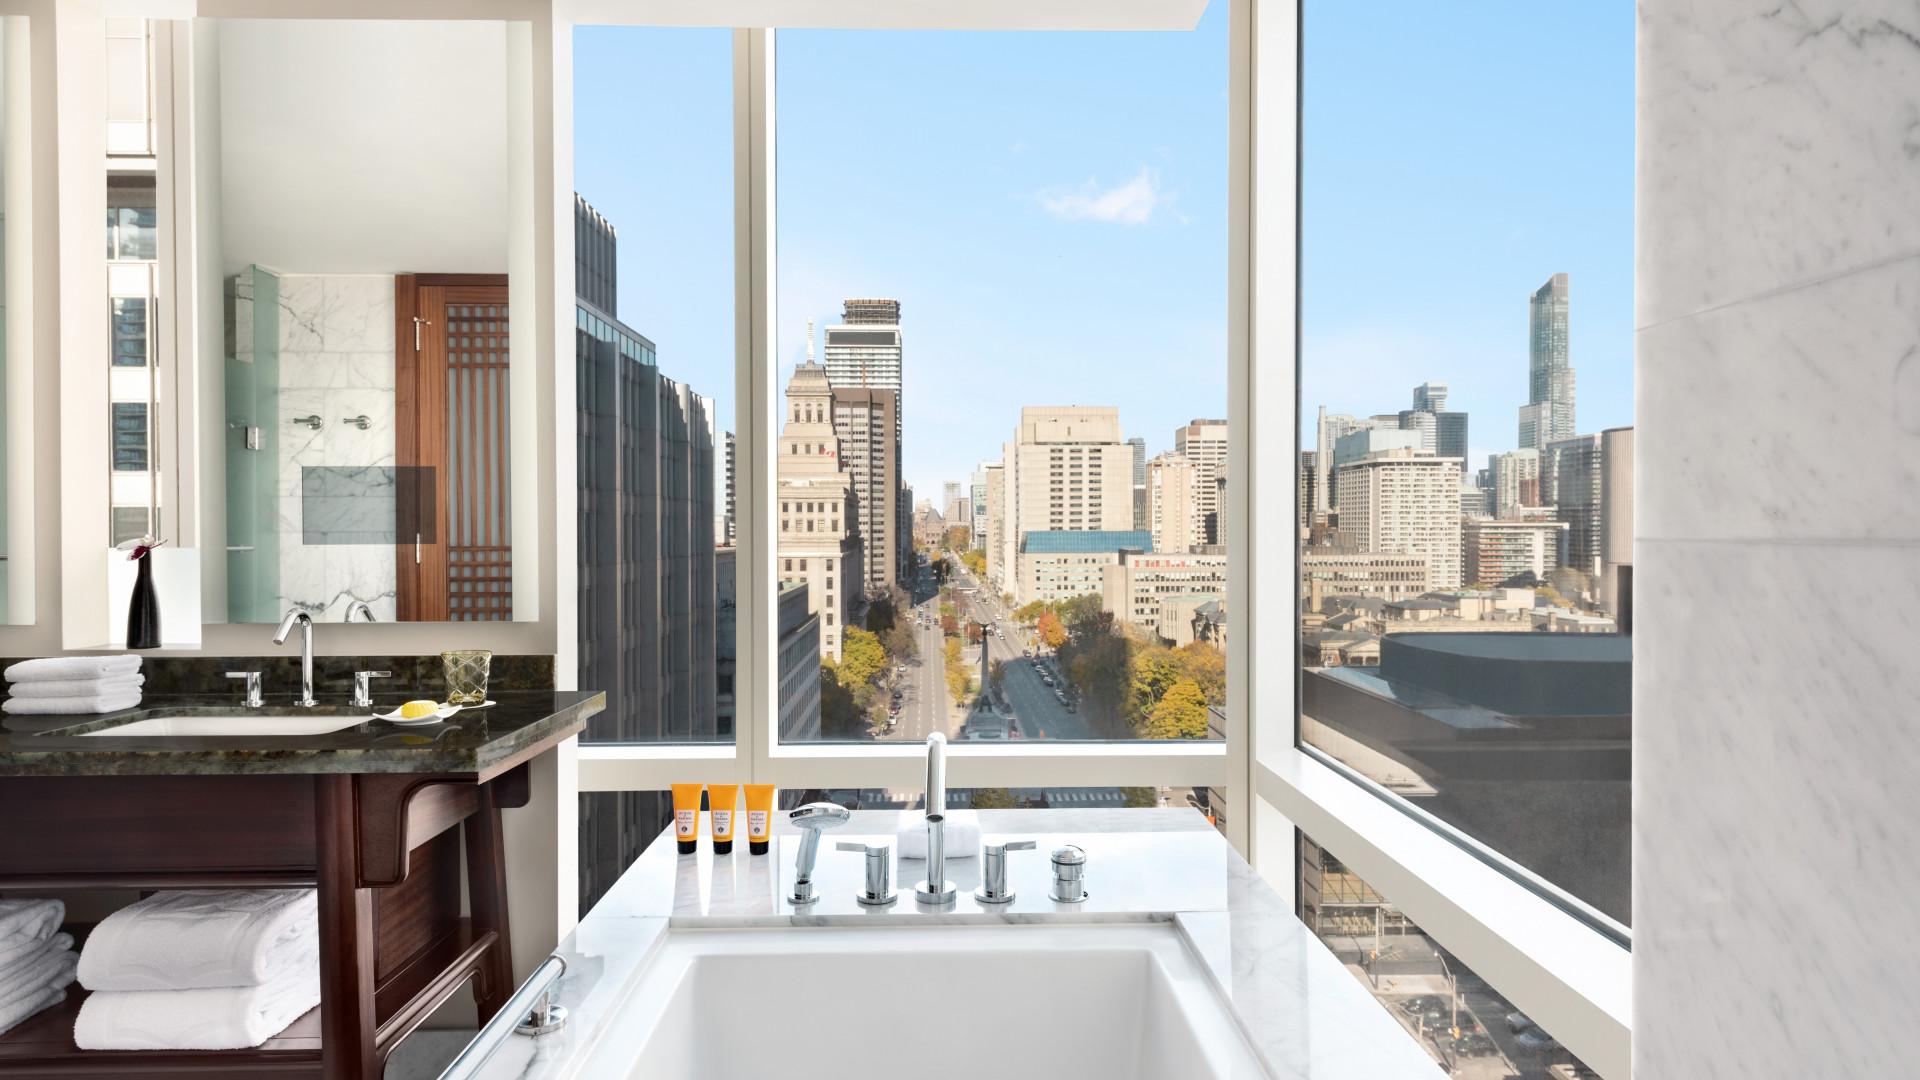 Shangri-La Toronto | The view from the tub